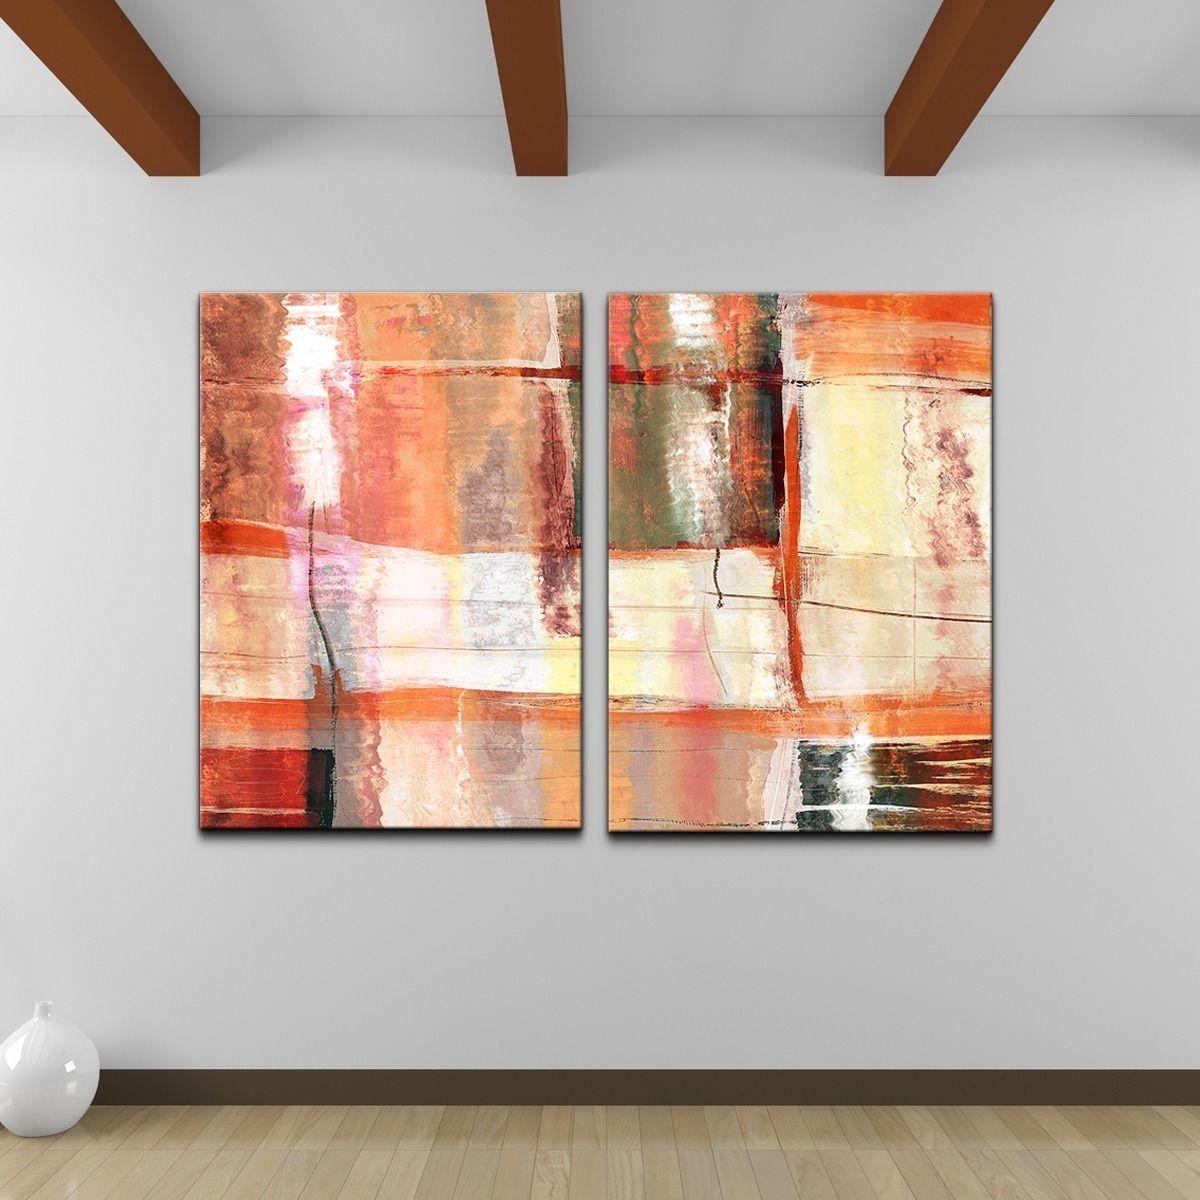 <li>Brand: Ready2HangArt</li> <li>Title: Abstract Spa</li> <li>Product type: Gallery-wrapped Canvas Art</li>